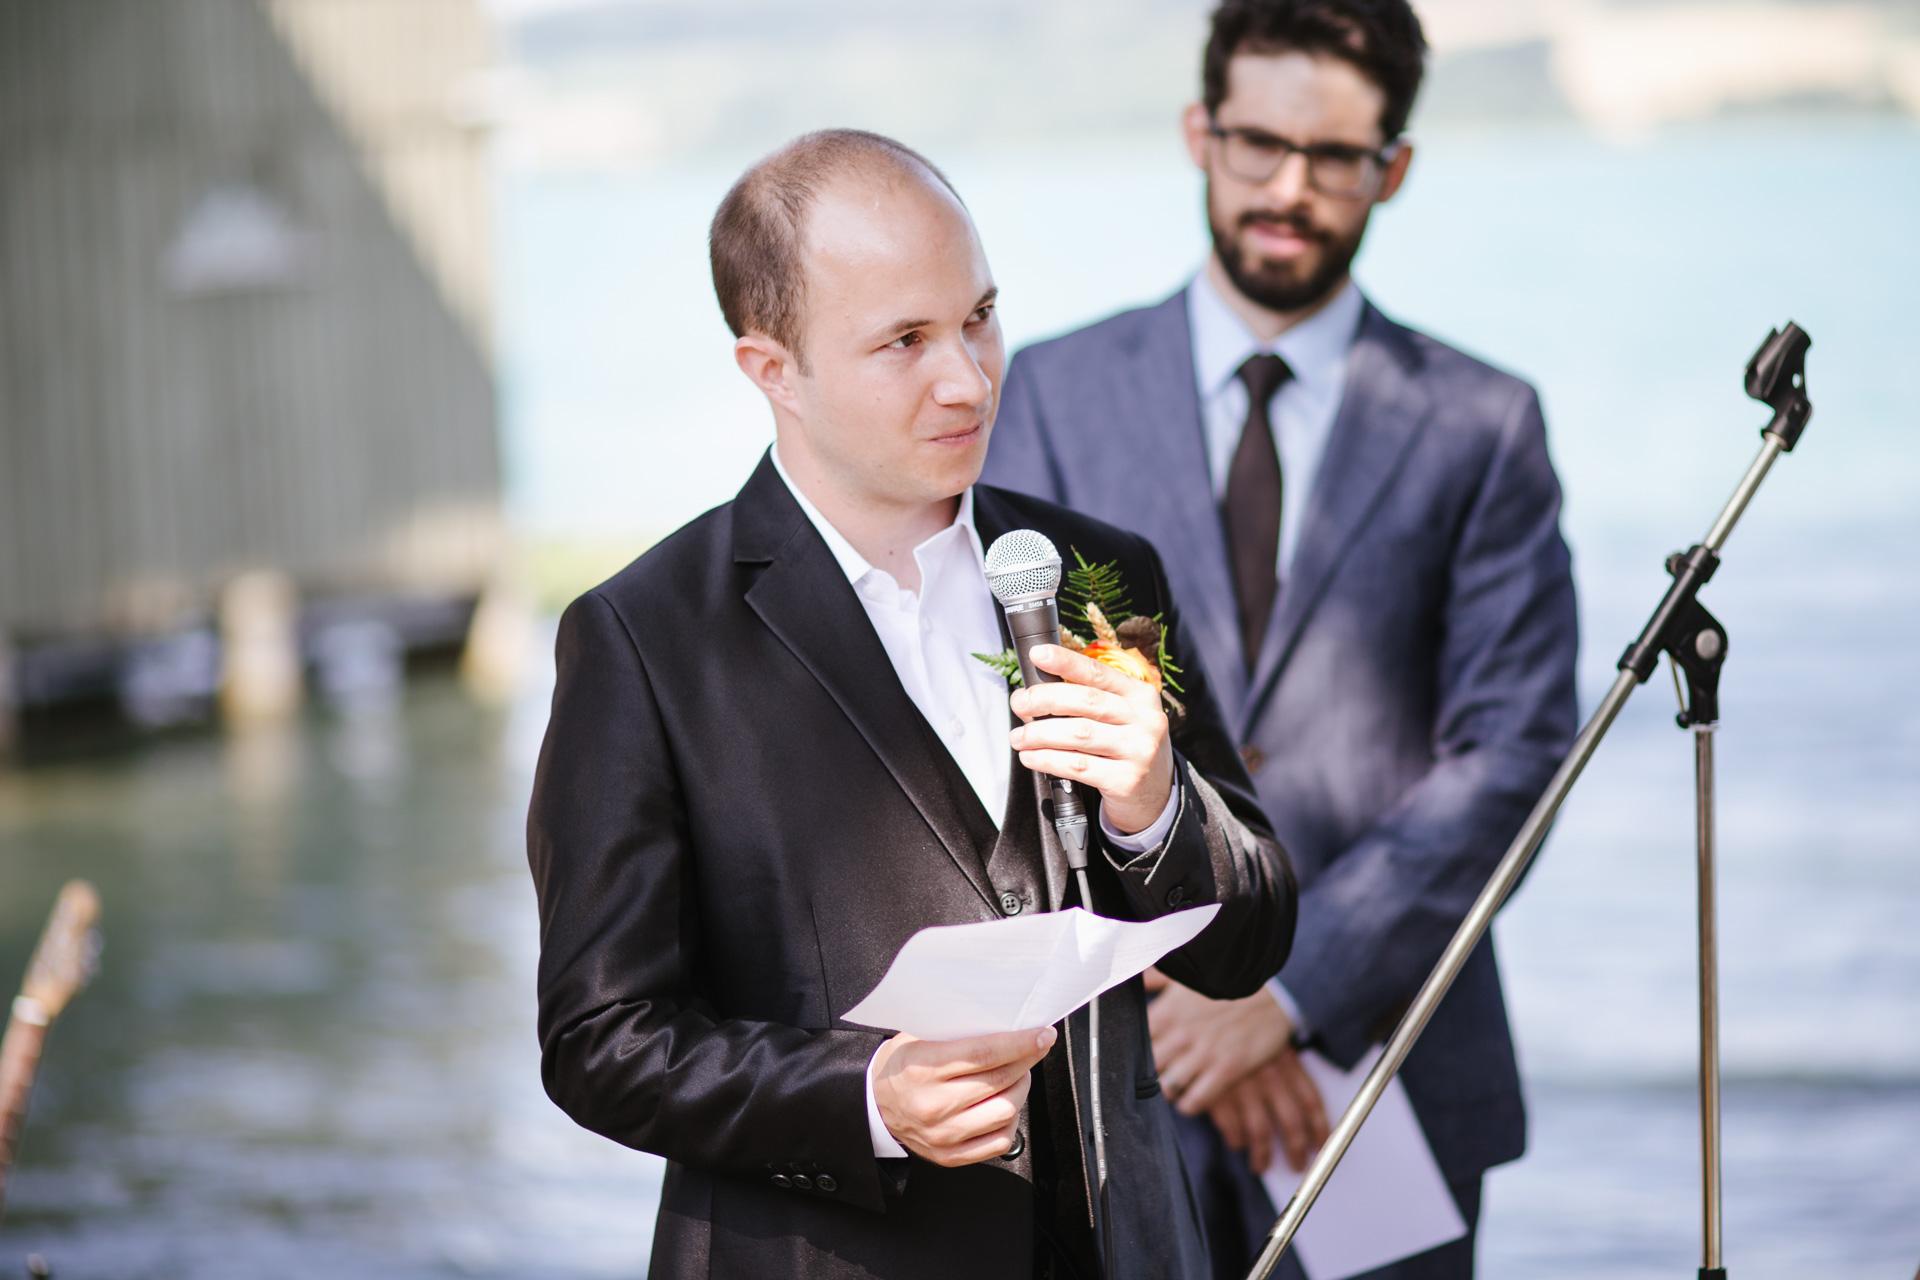 Pixelart_Hochzeitsfotografen_Loerrach_Rheinfelden_Hallwil_Schweiz_Linda-Ramon-1036